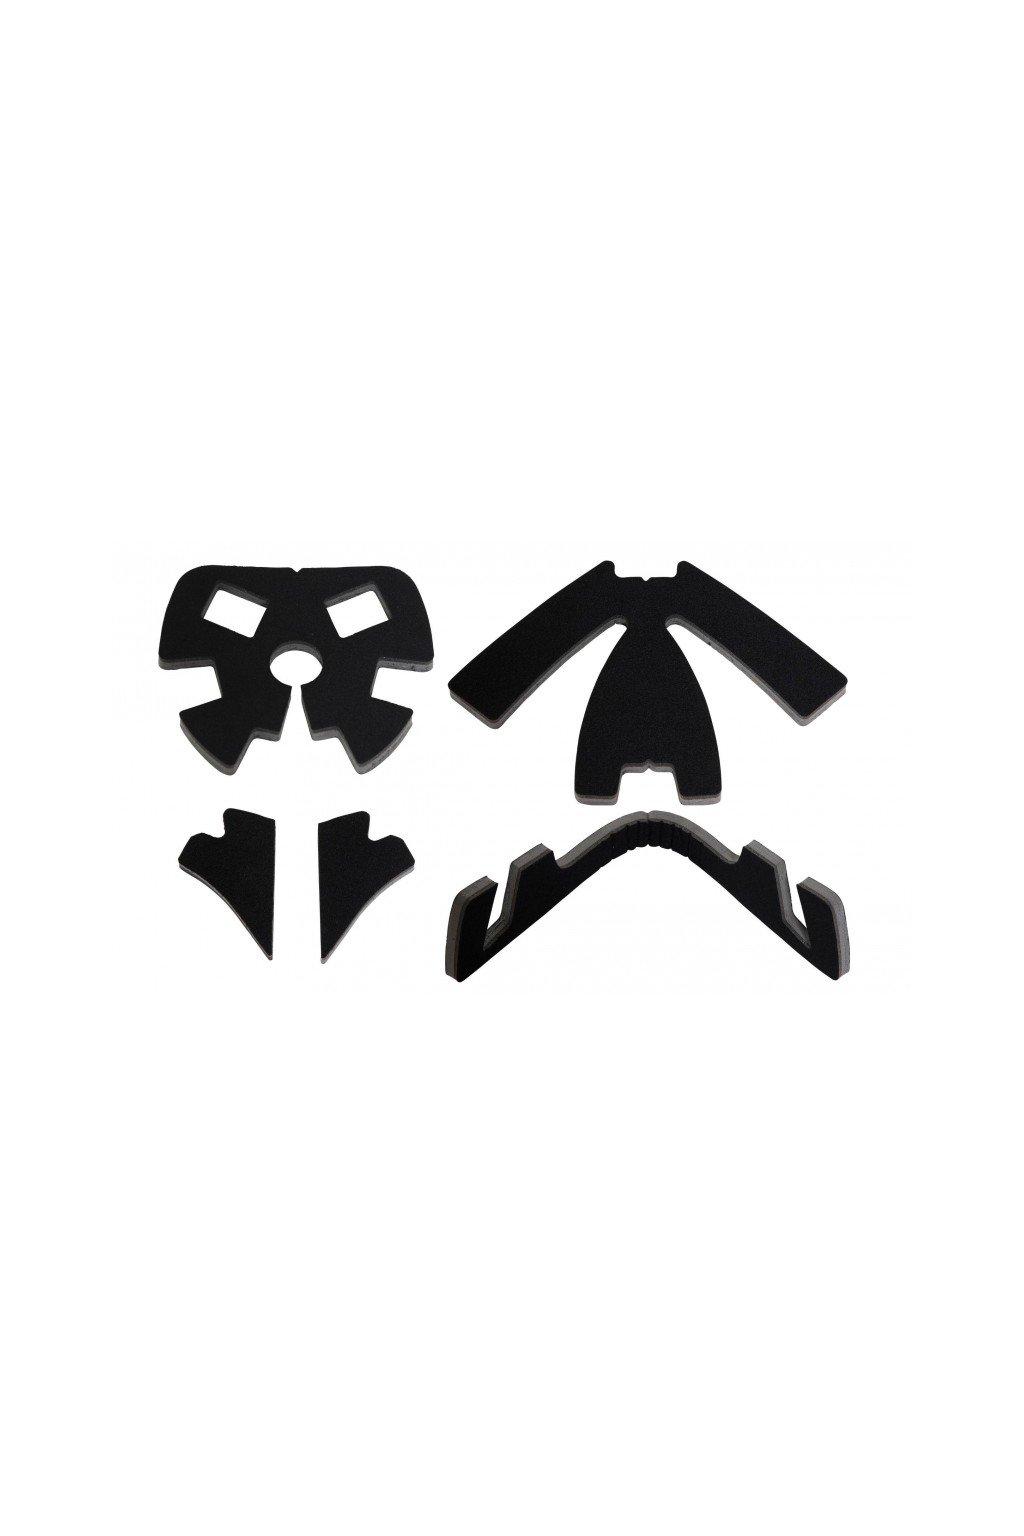 salming elite helmet interior padding black